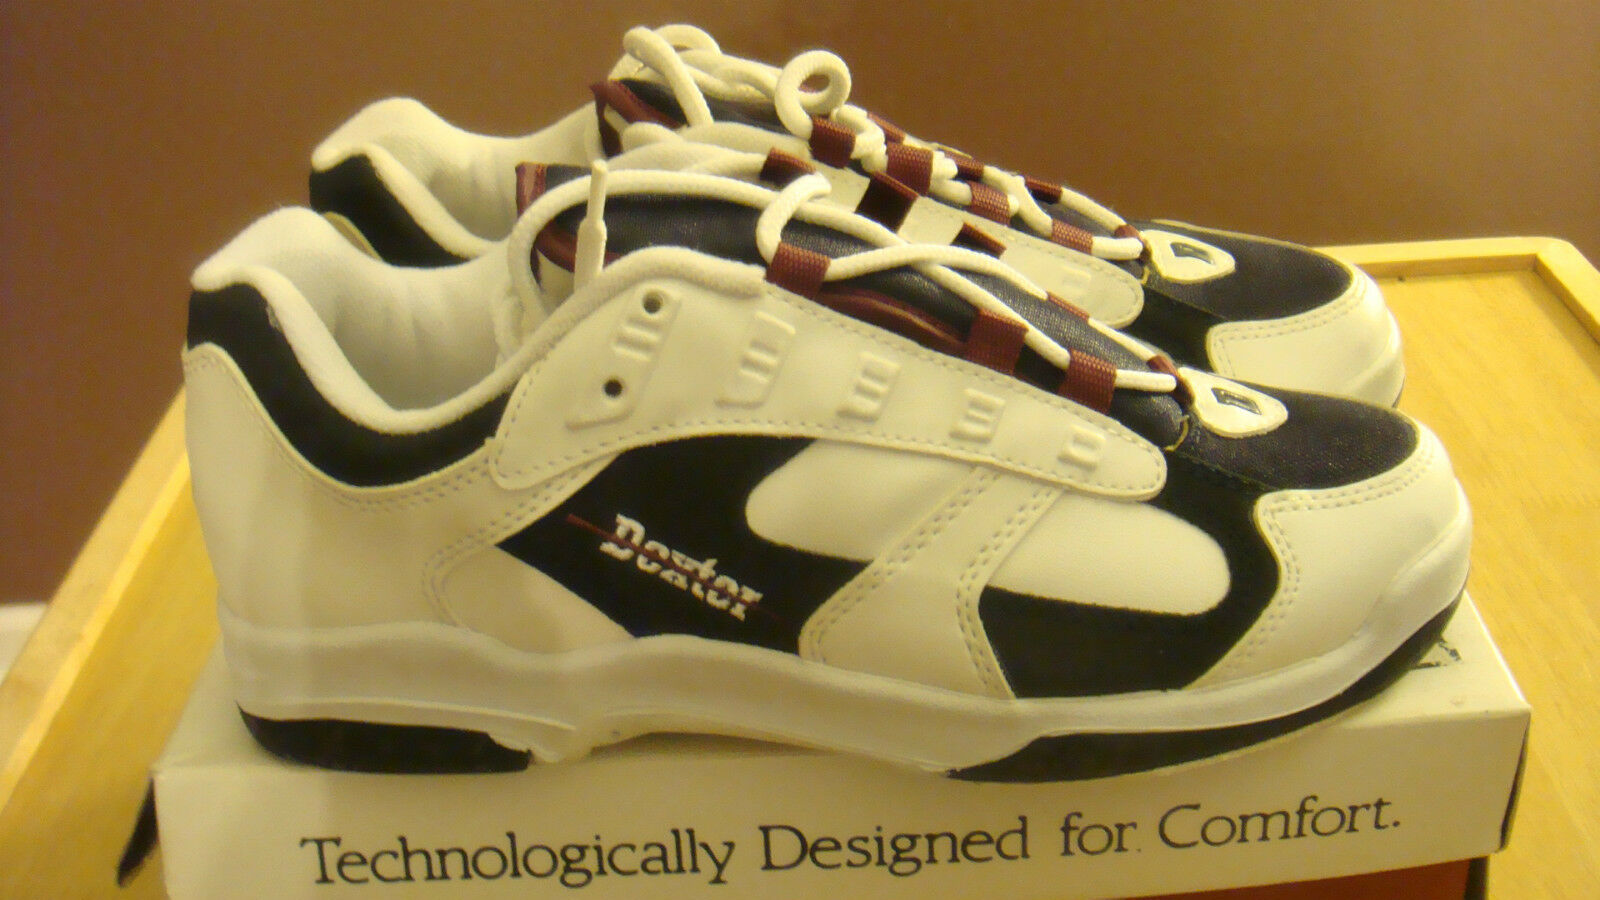 BRAND NEW Mens Dexter Phil Size 7 M Bowling Ball shoes White Navy Burg No Bag